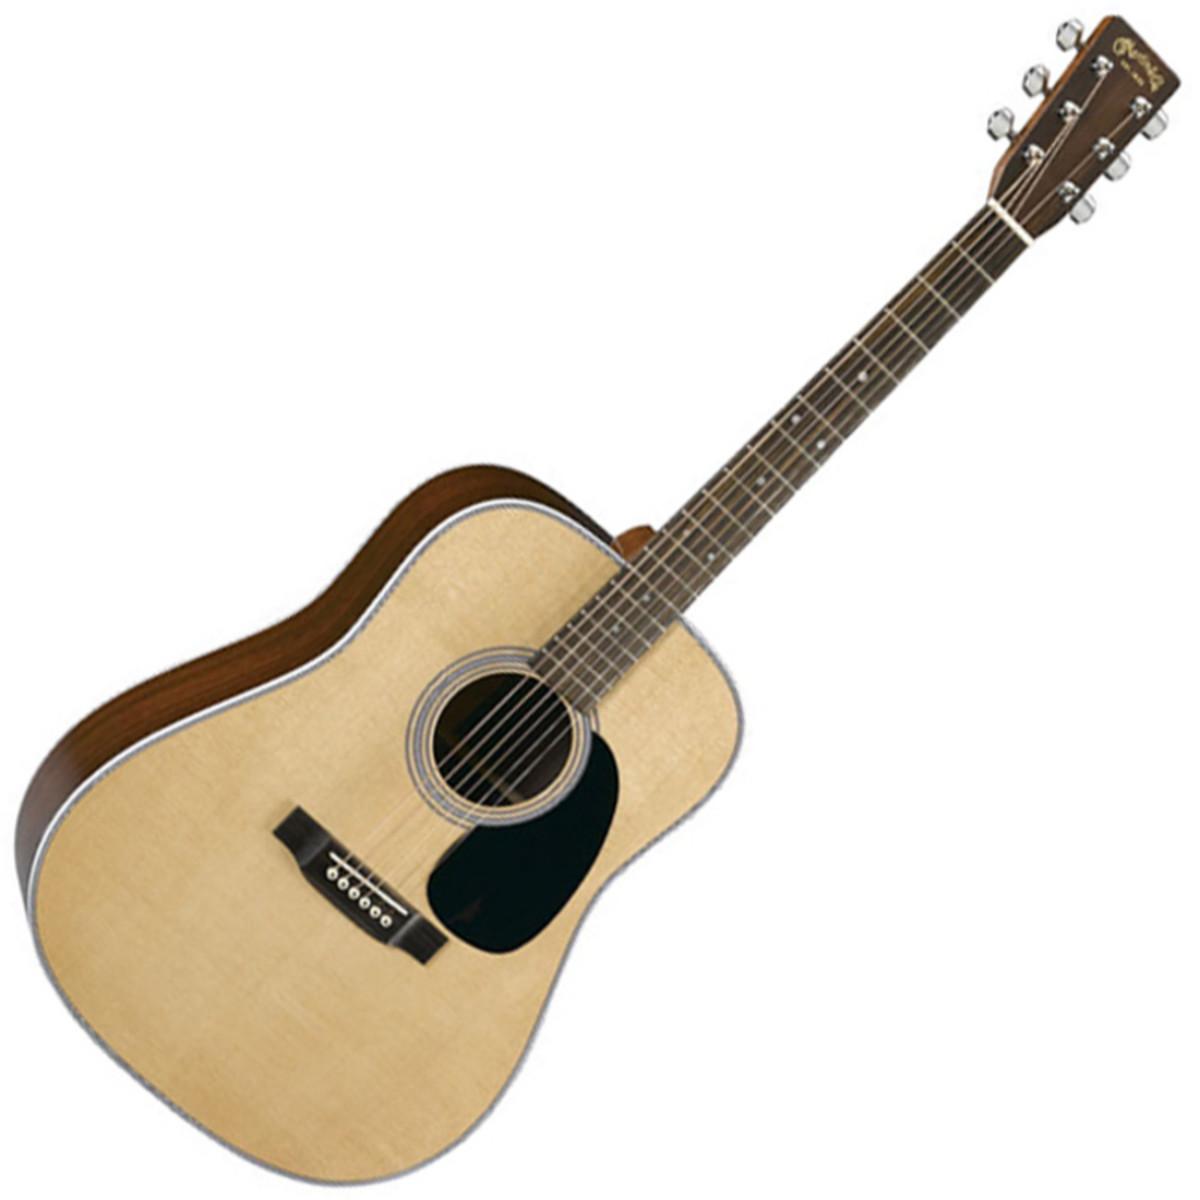 D28 Martin Guitars : martin d28 standard series dreadnought acoustic natural ex demo at ~ Vivirlamusica.com Haus und Dekorationen